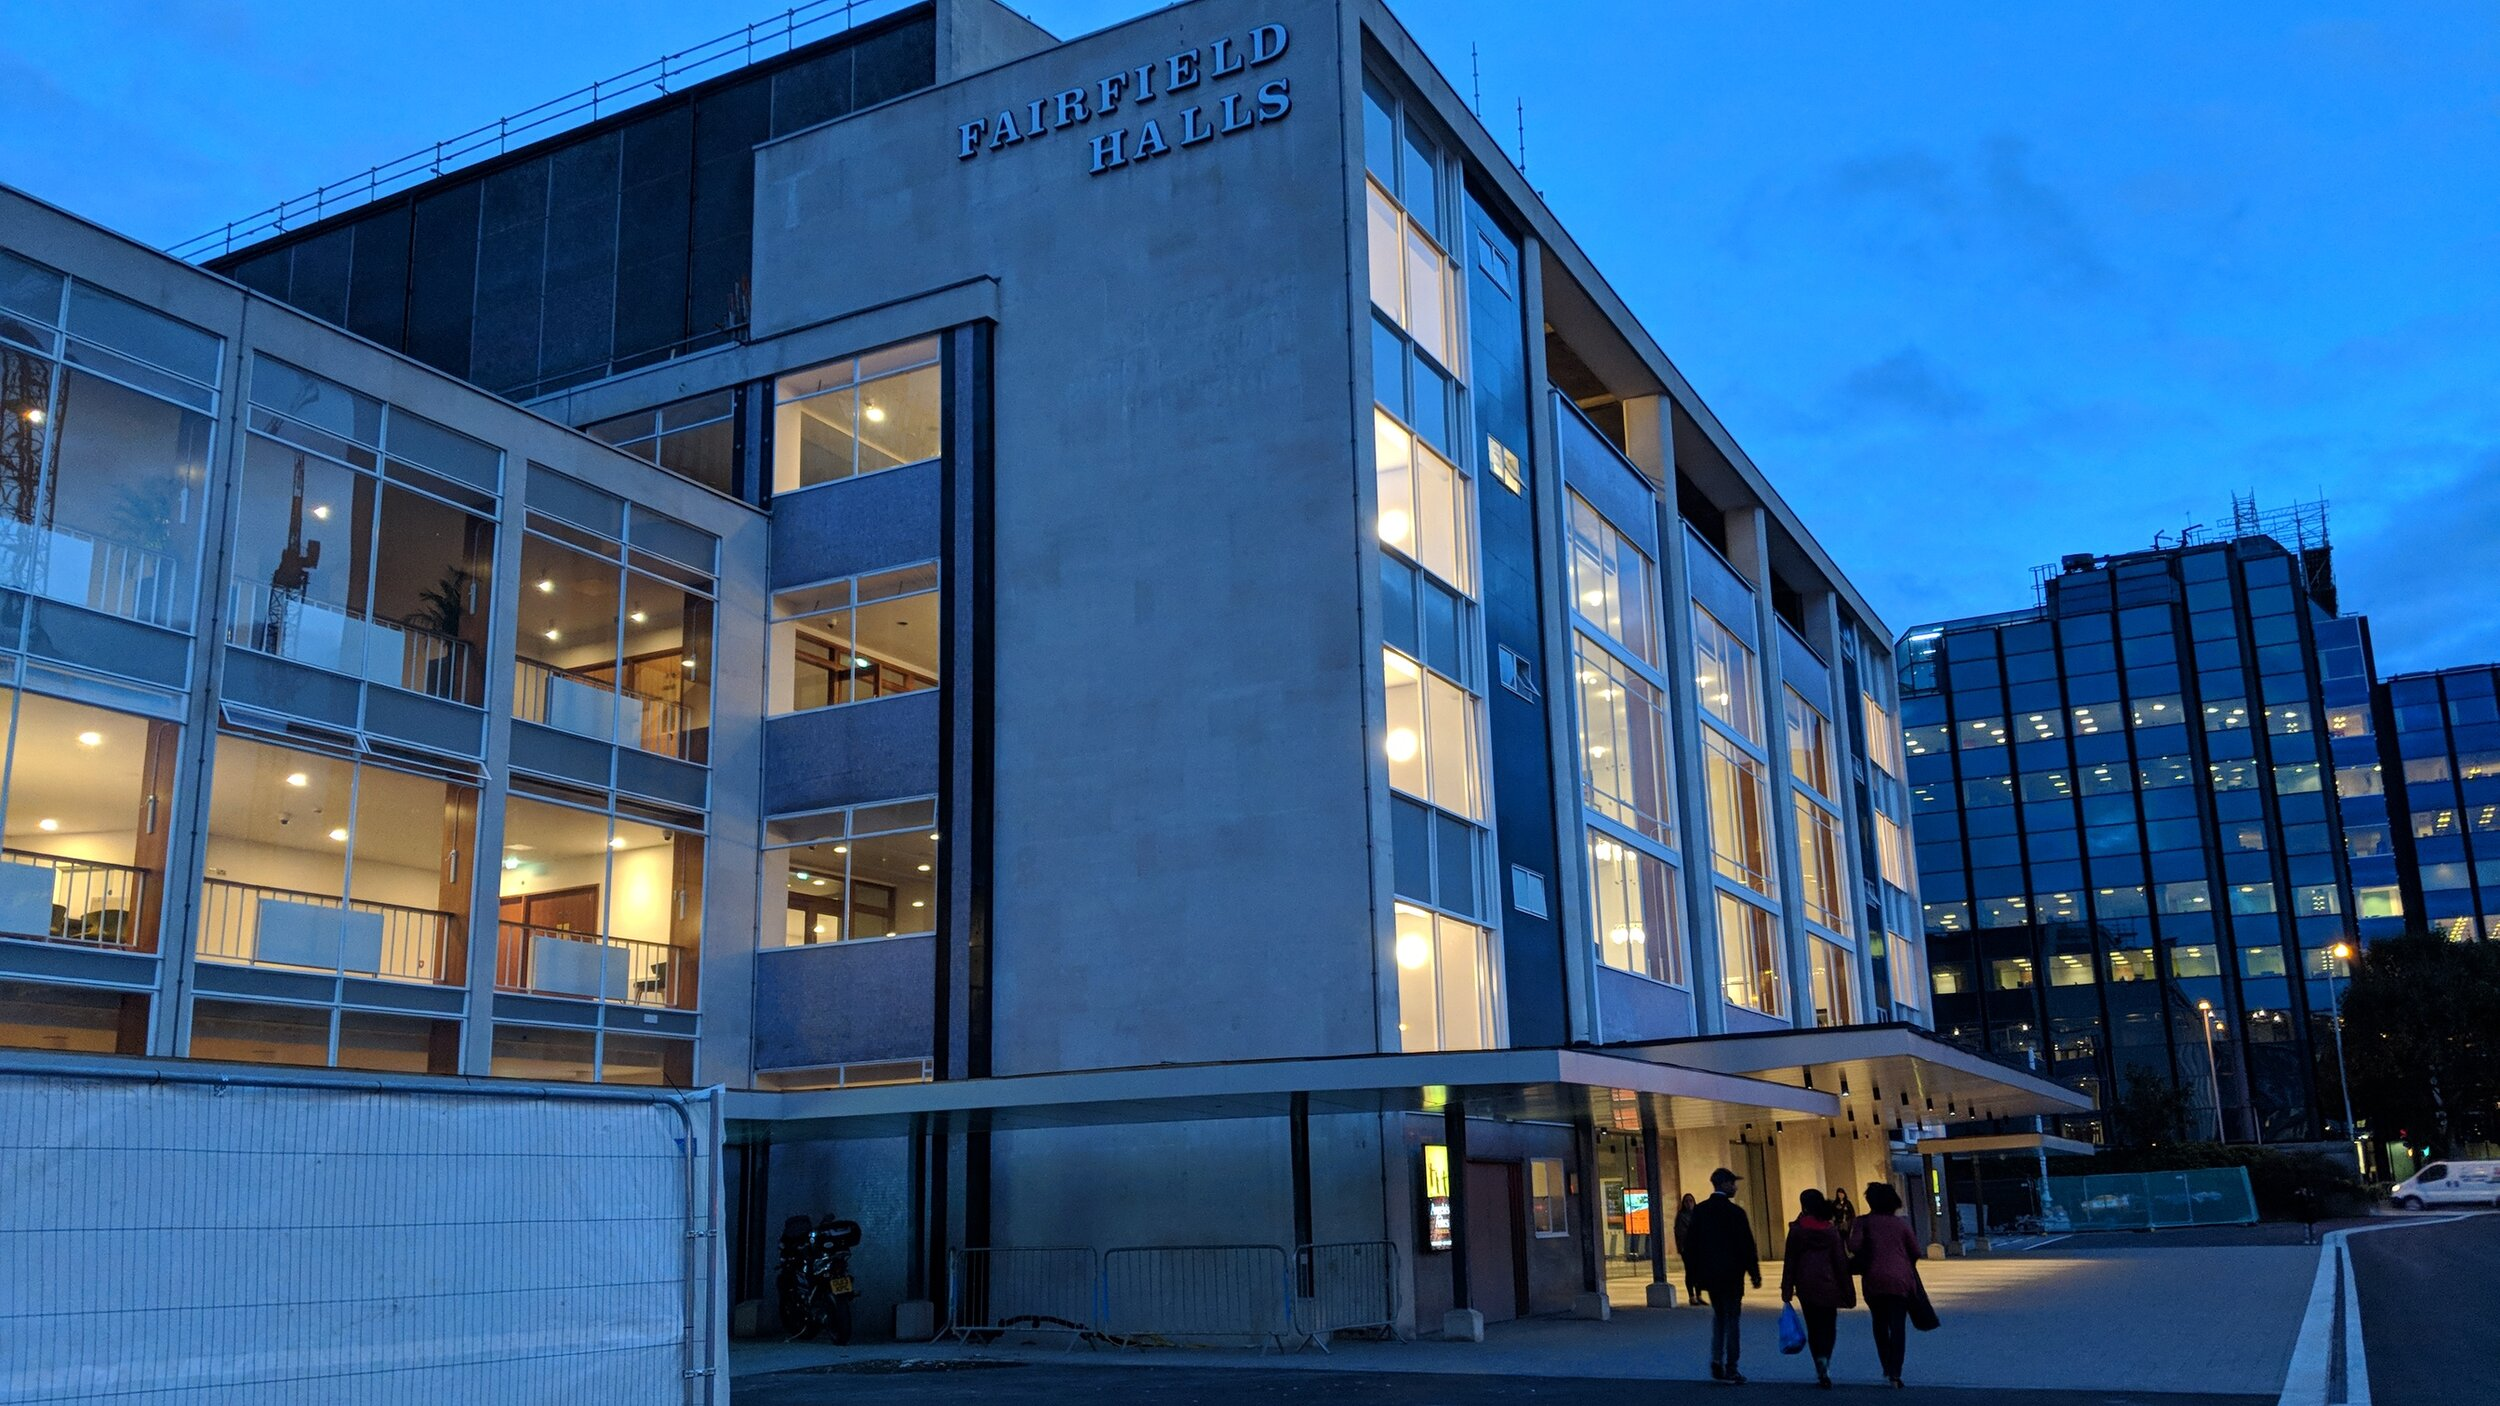 Fairfield Halls(Ashcroft Theatre) - visited 25/09/2019